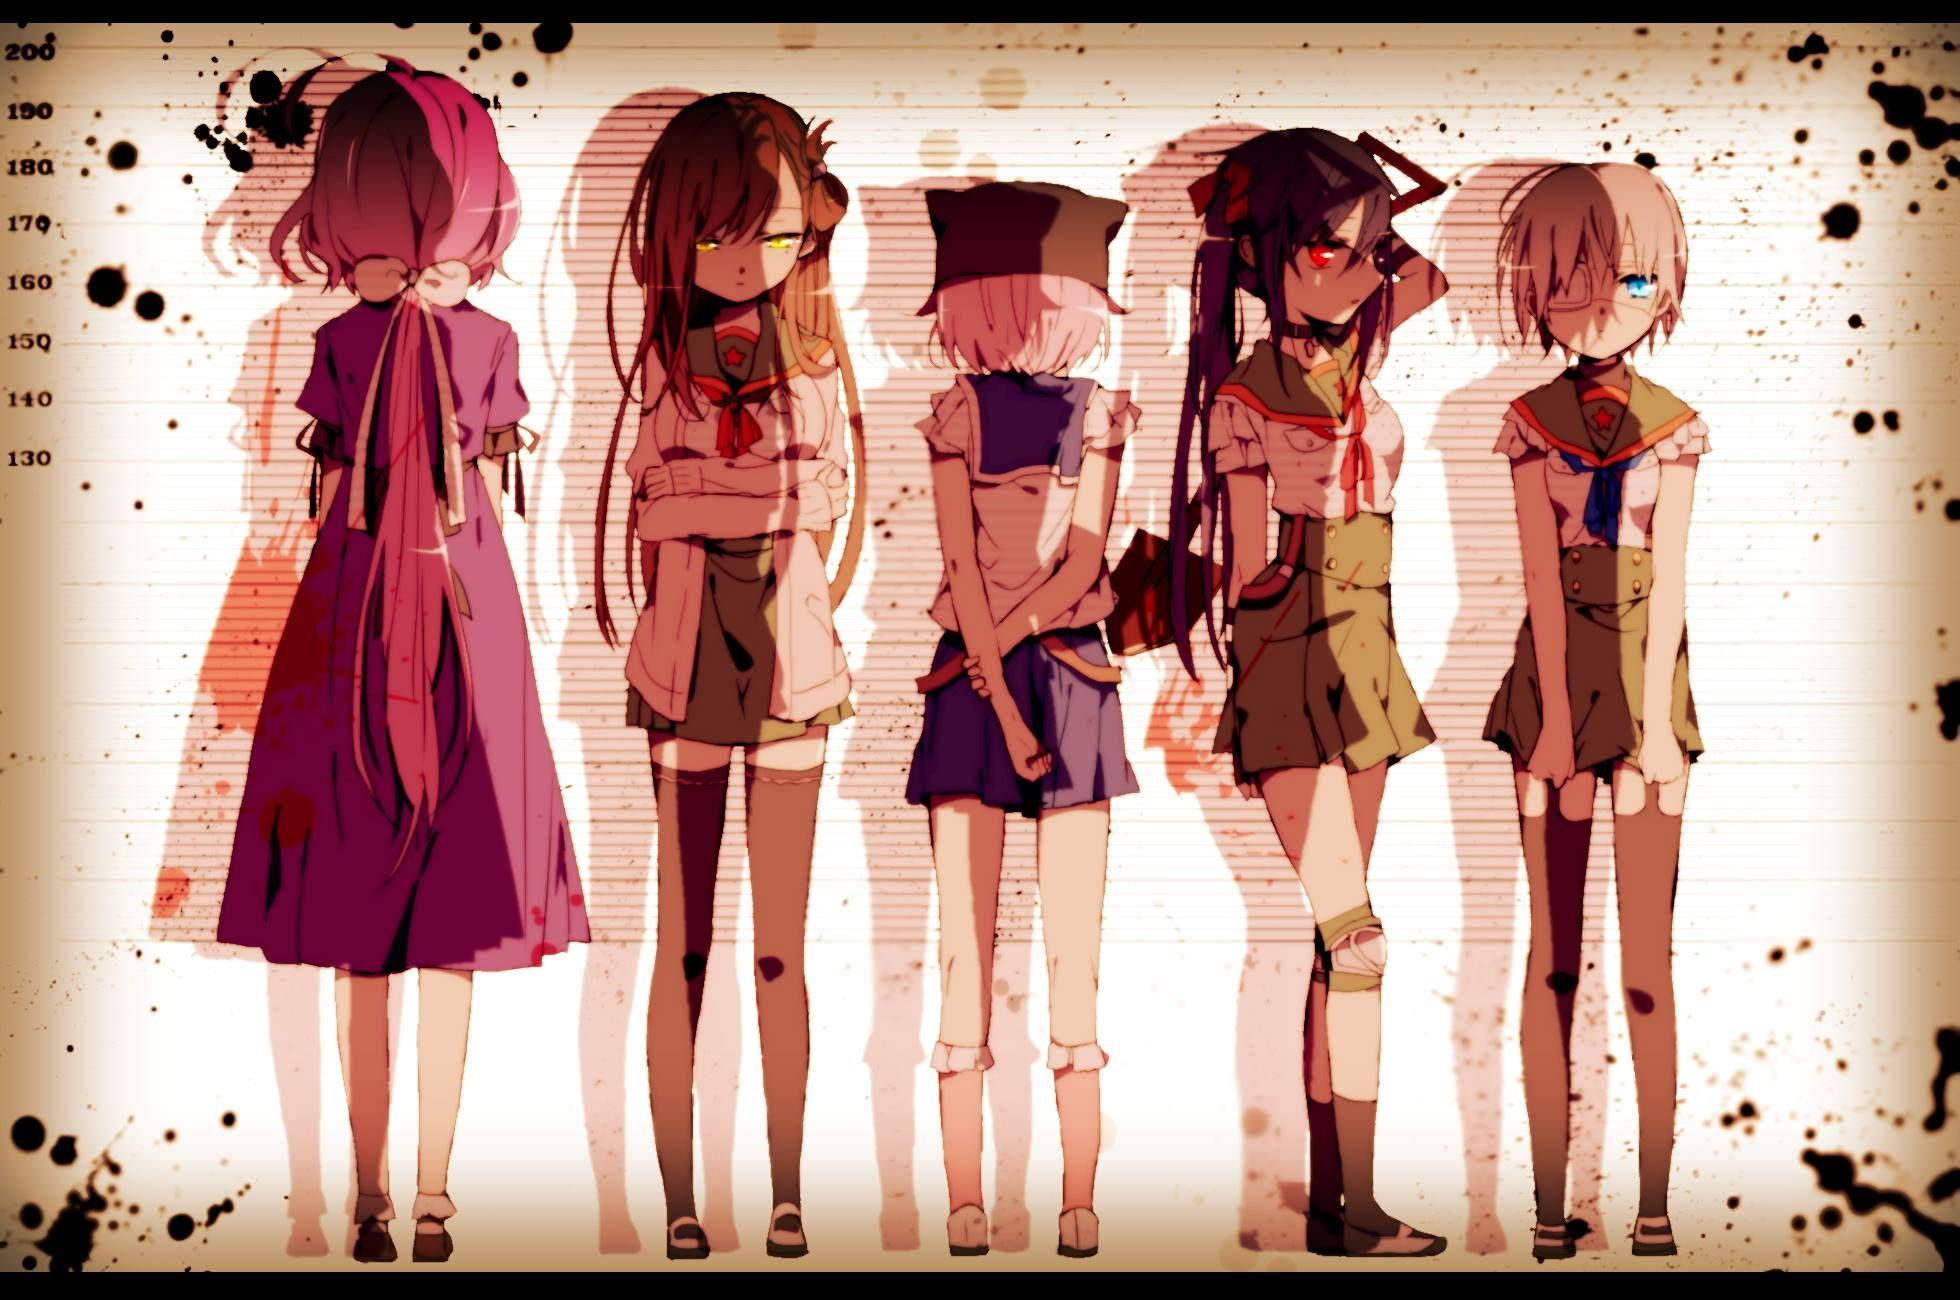 hintergrundbilder おしゃれまとめの人気アイデア pinterest animeislife がっこうぐらし アニメの女の子 冬木